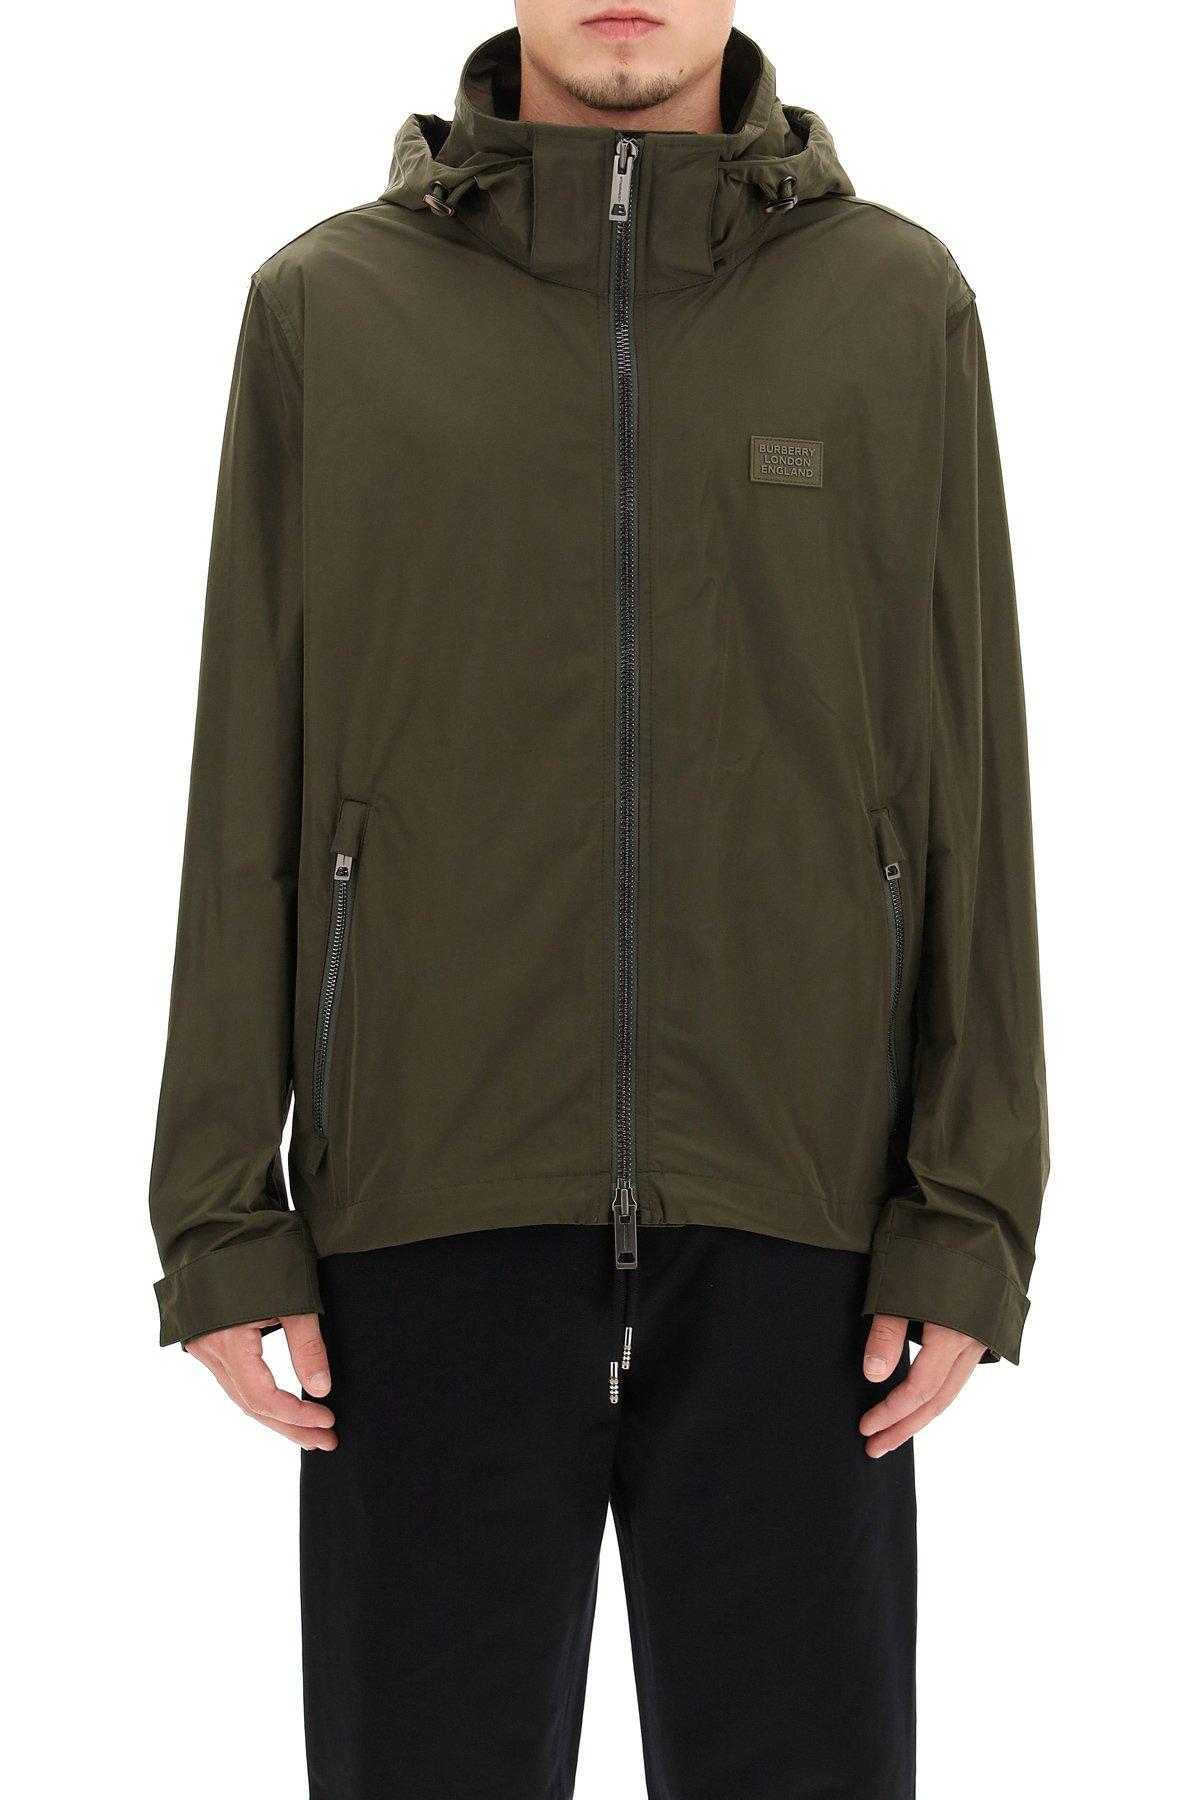 Burberry giacca antipioggia hargrave